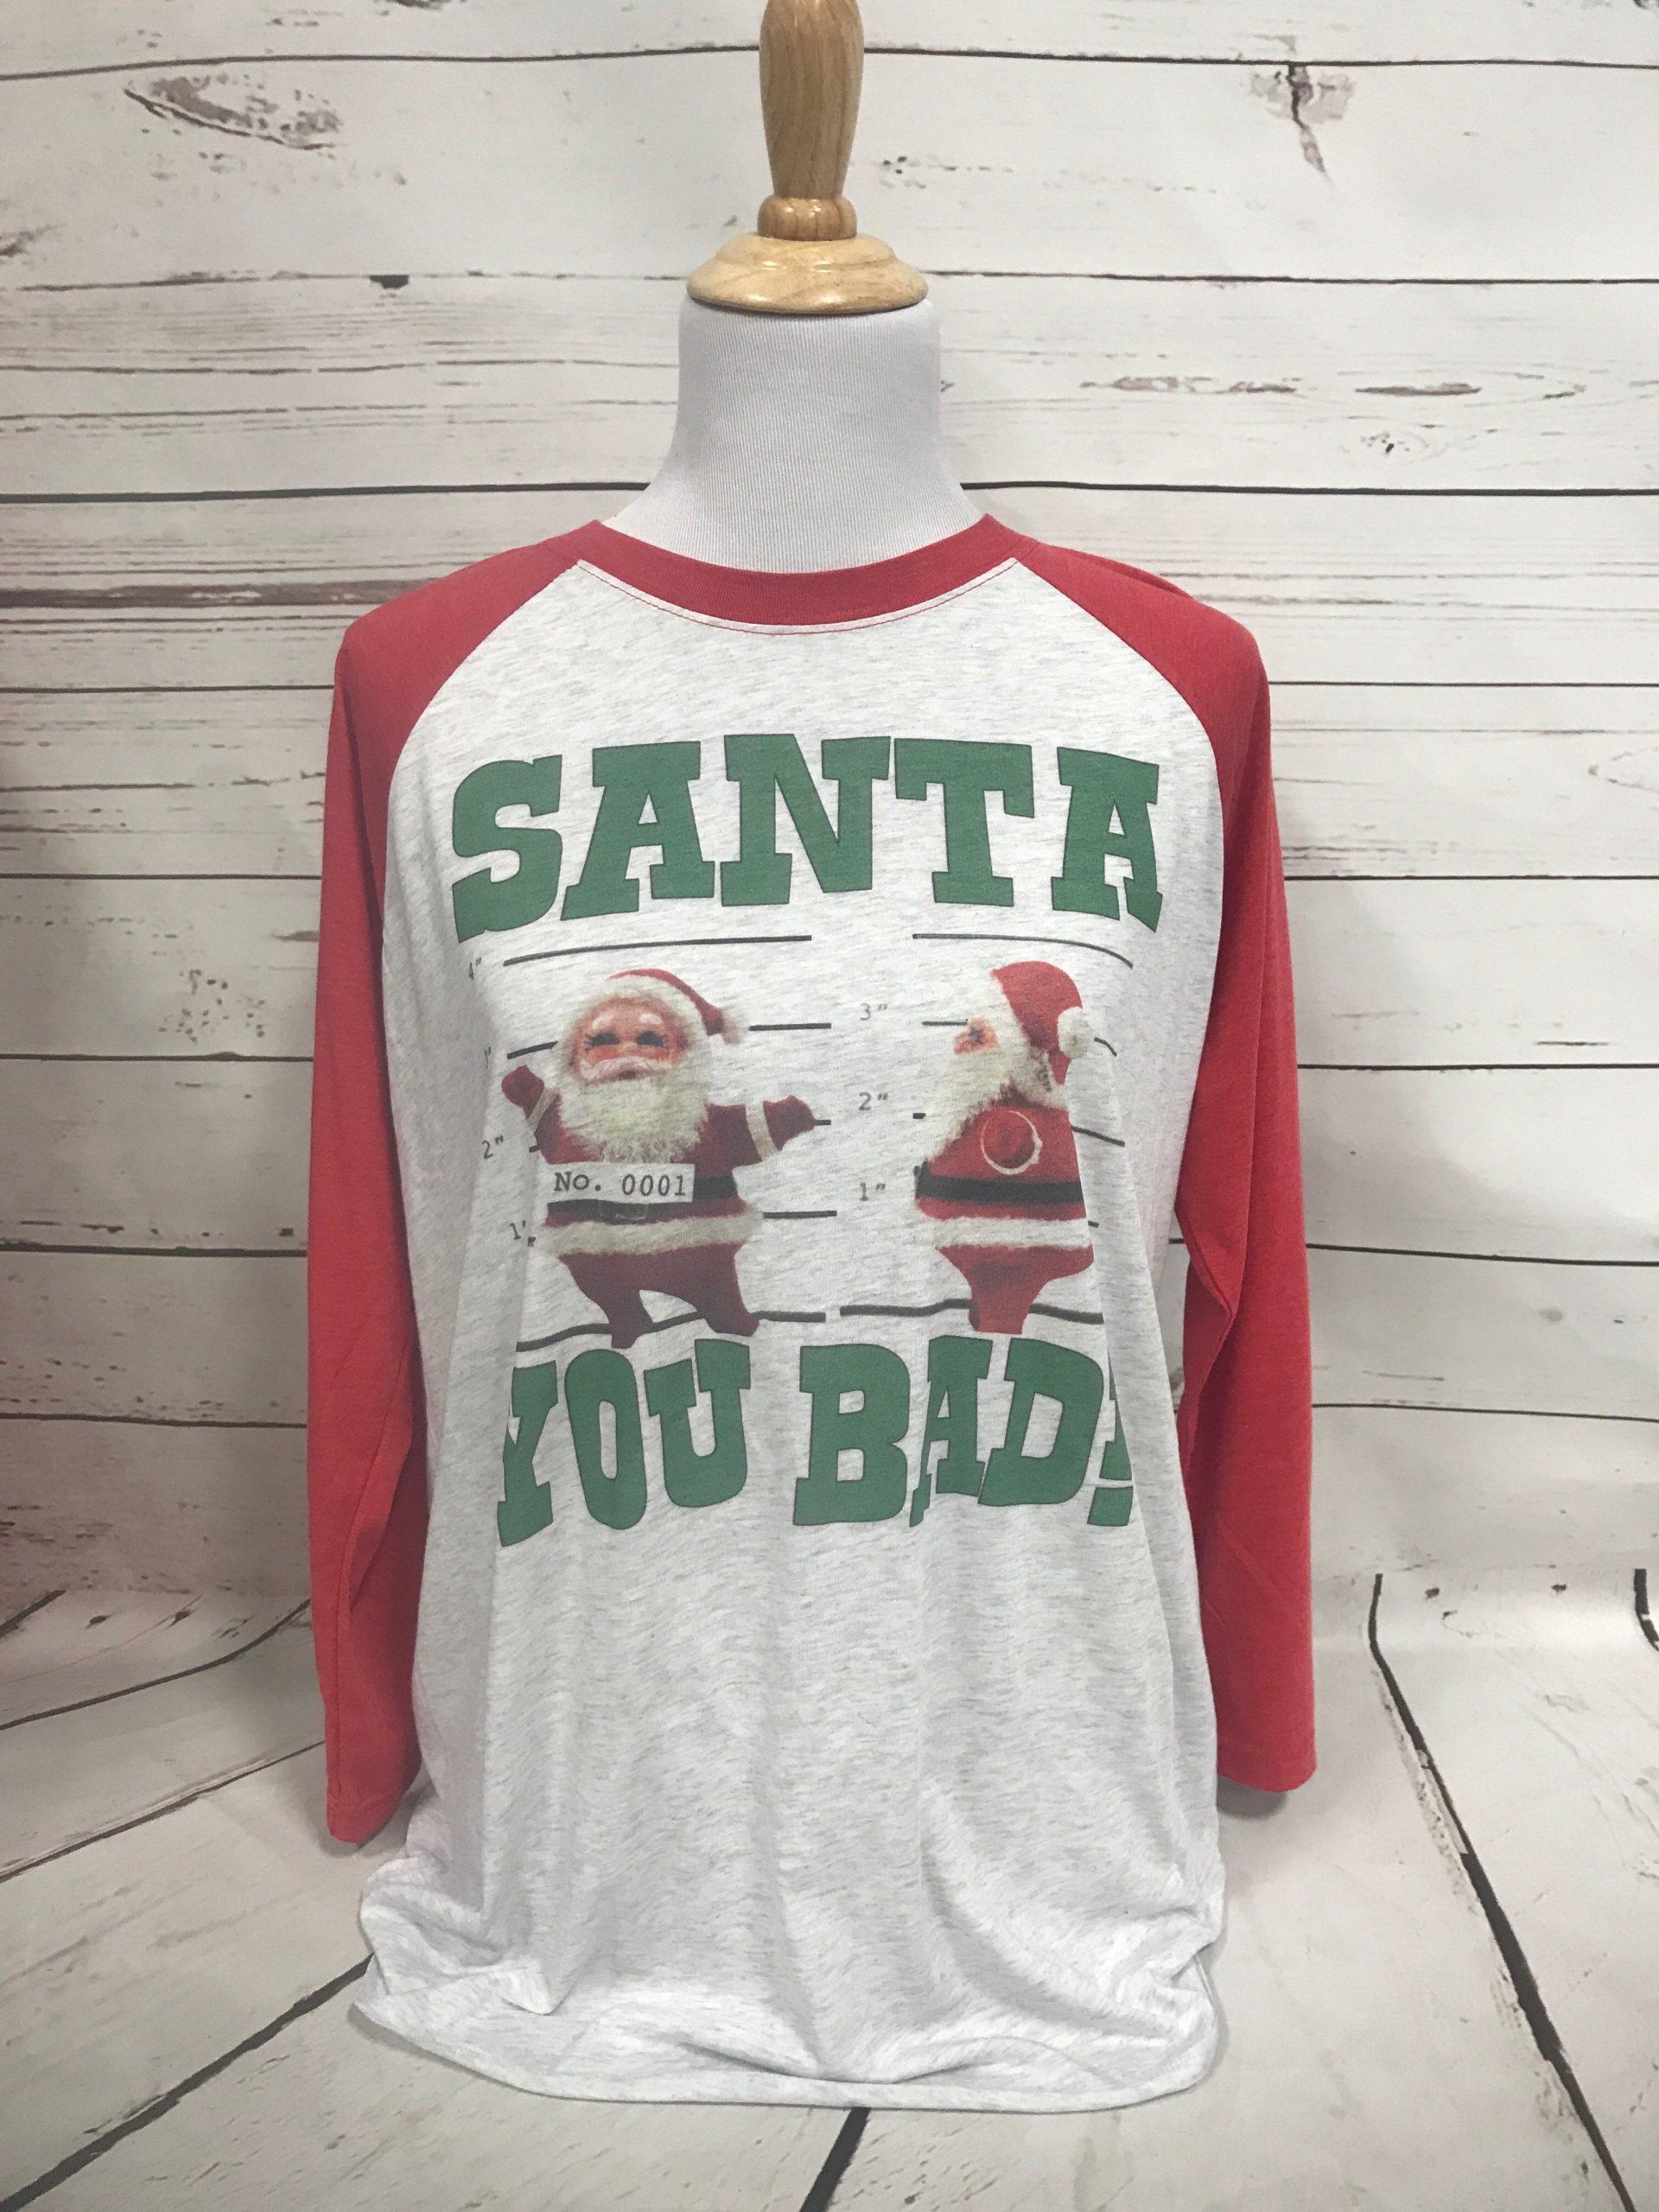 Santa You Bad on Vintage Red and Heather Baseball tee